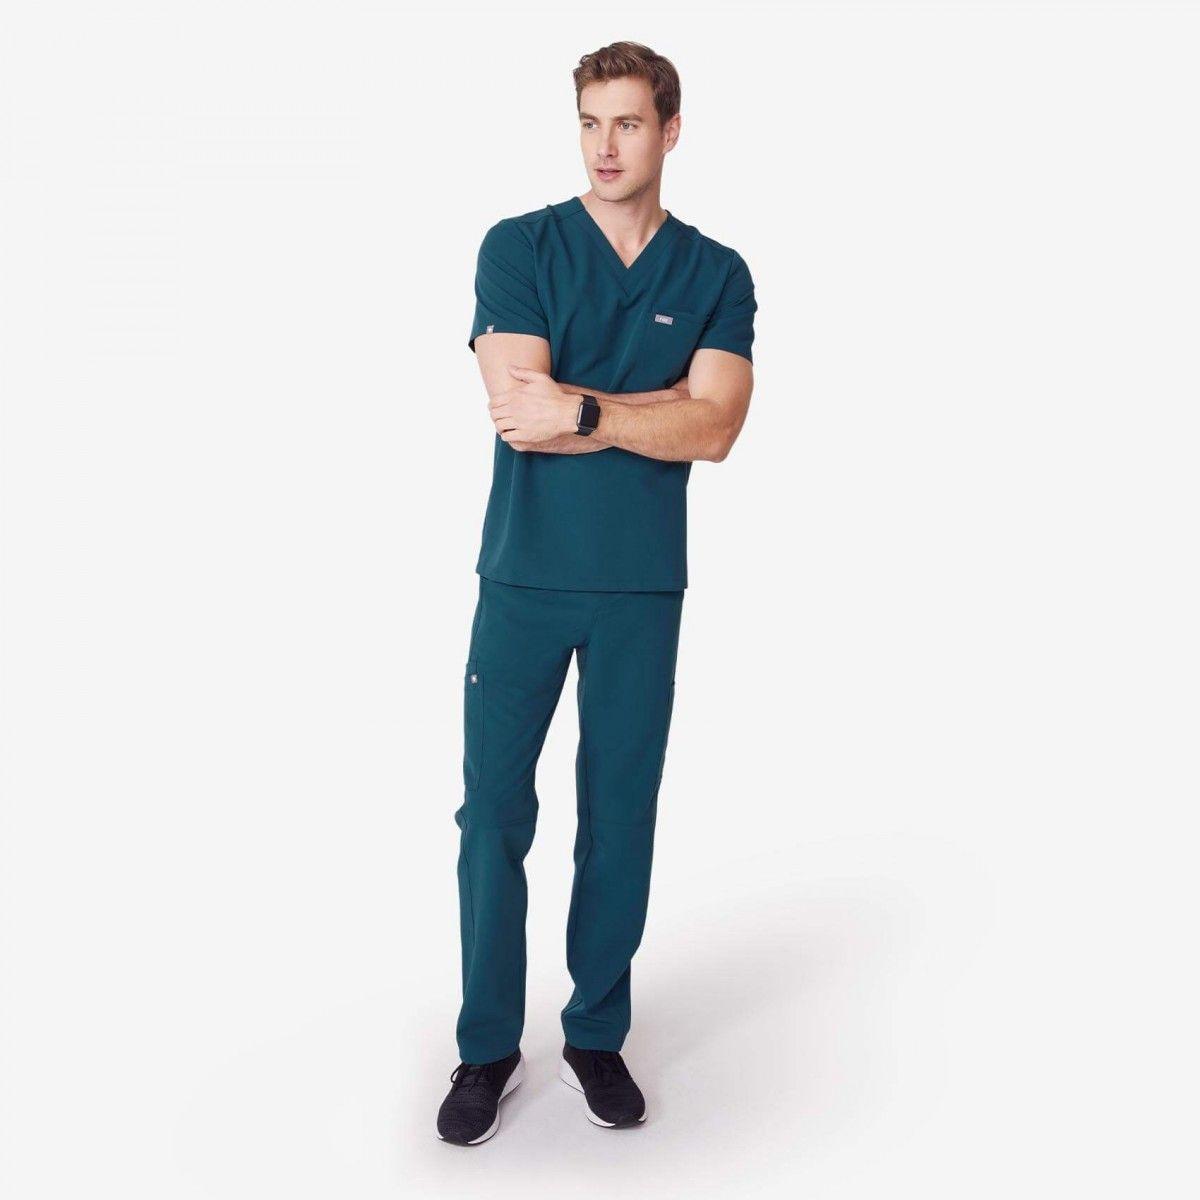 Navy Blue, XS FIGS Medical Scrubs Mens Leon Two-Pocket Scrub top